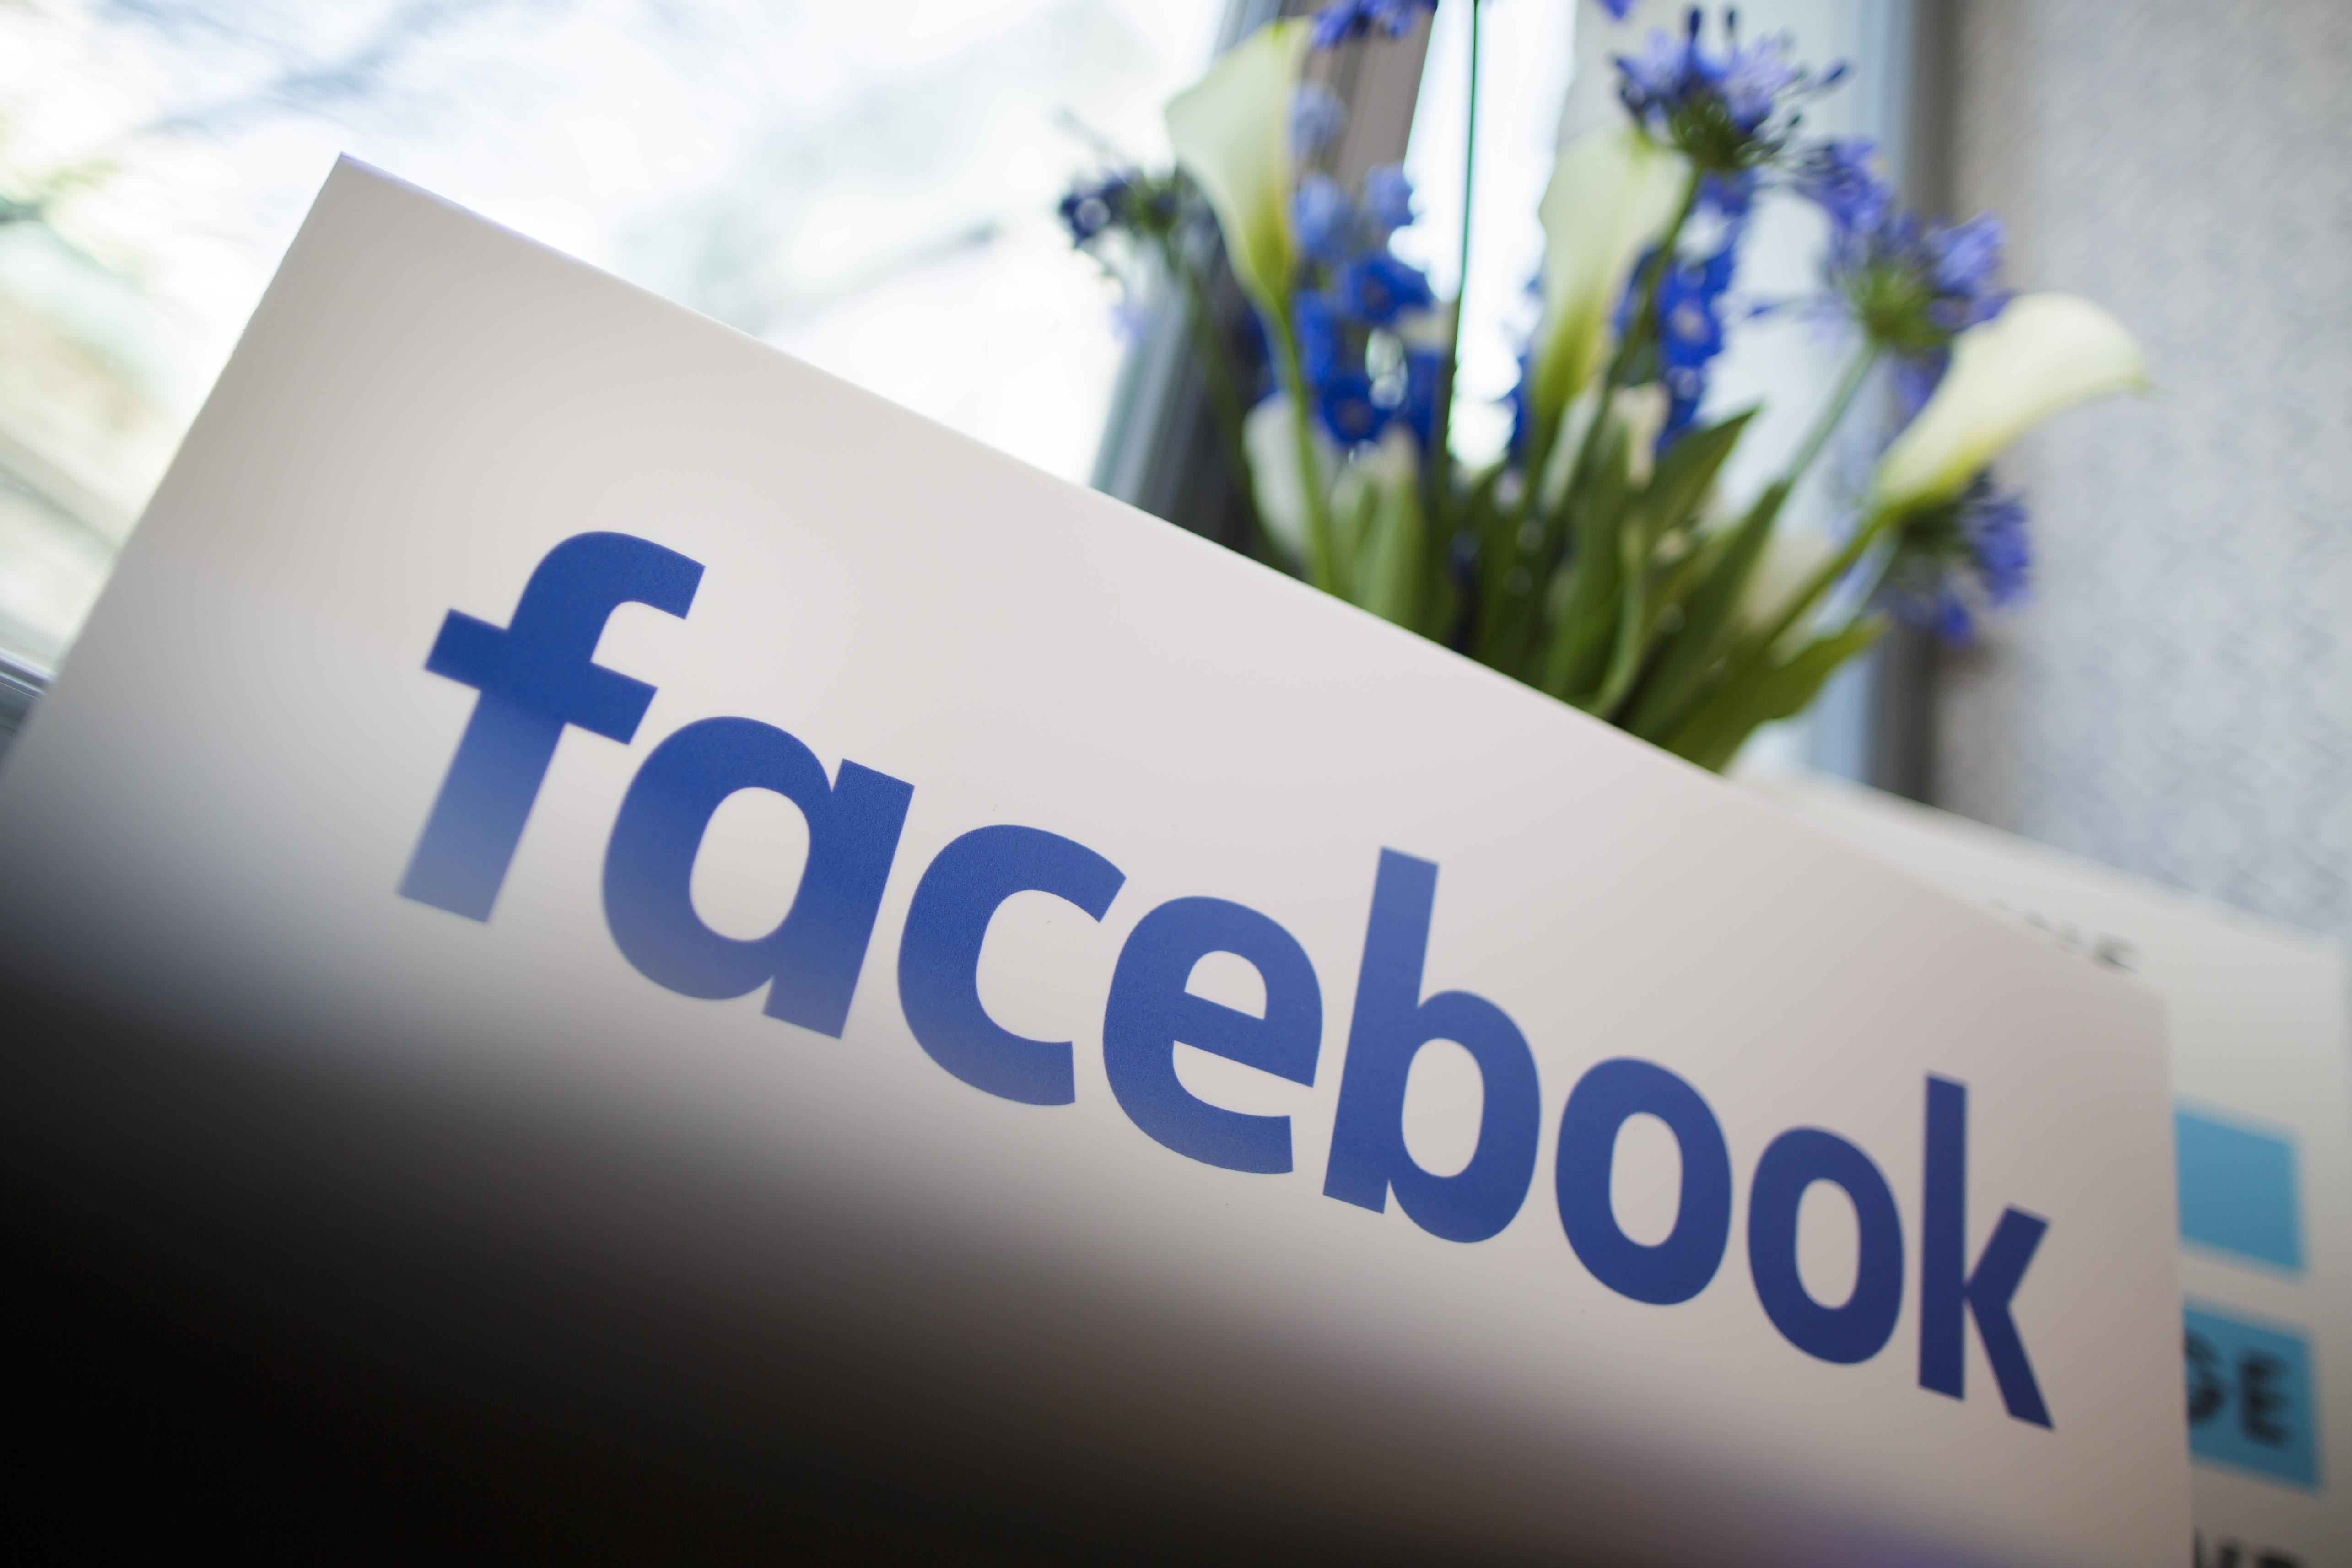 Company Logo of Facebook on January 18, 2016 in Berlin, Germany.